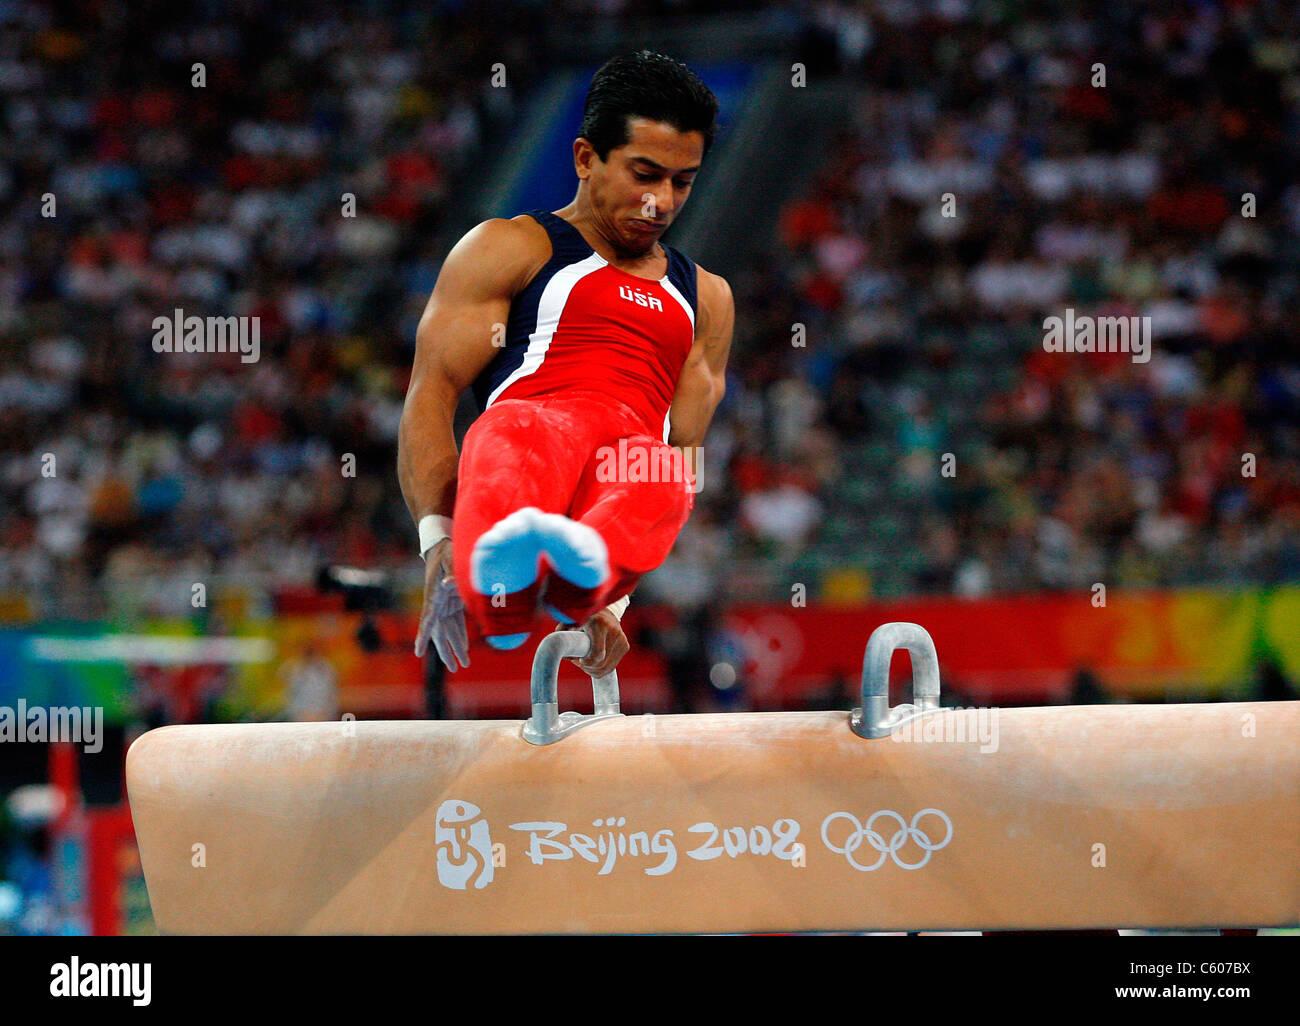 RAJ BHAVSAR USA OLYMPIC STADIUM BEIJING CHINA 12 August 2008 - Stock Image